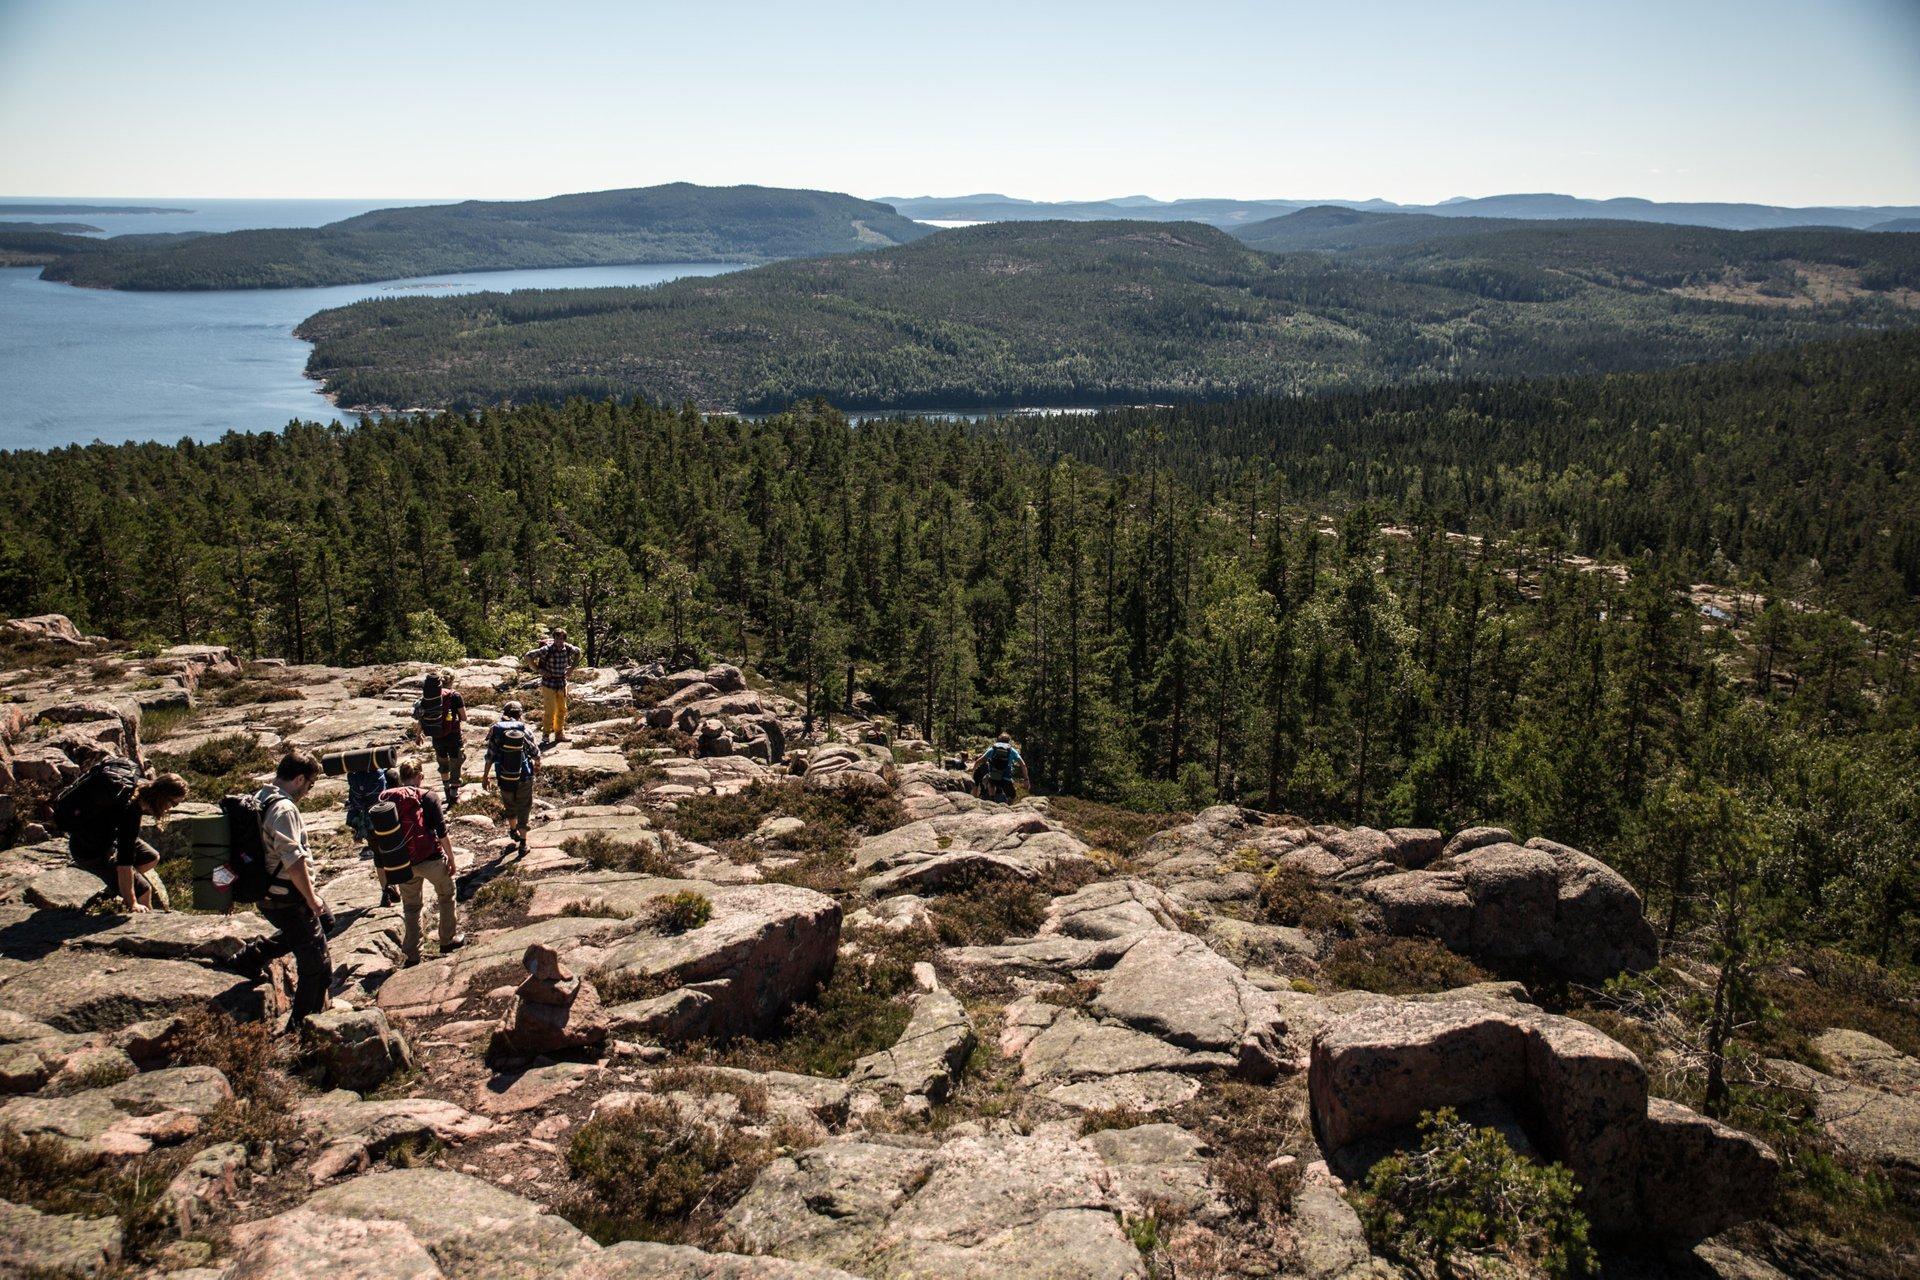 Hiking and Trekking in Sweden - Best Season 2019